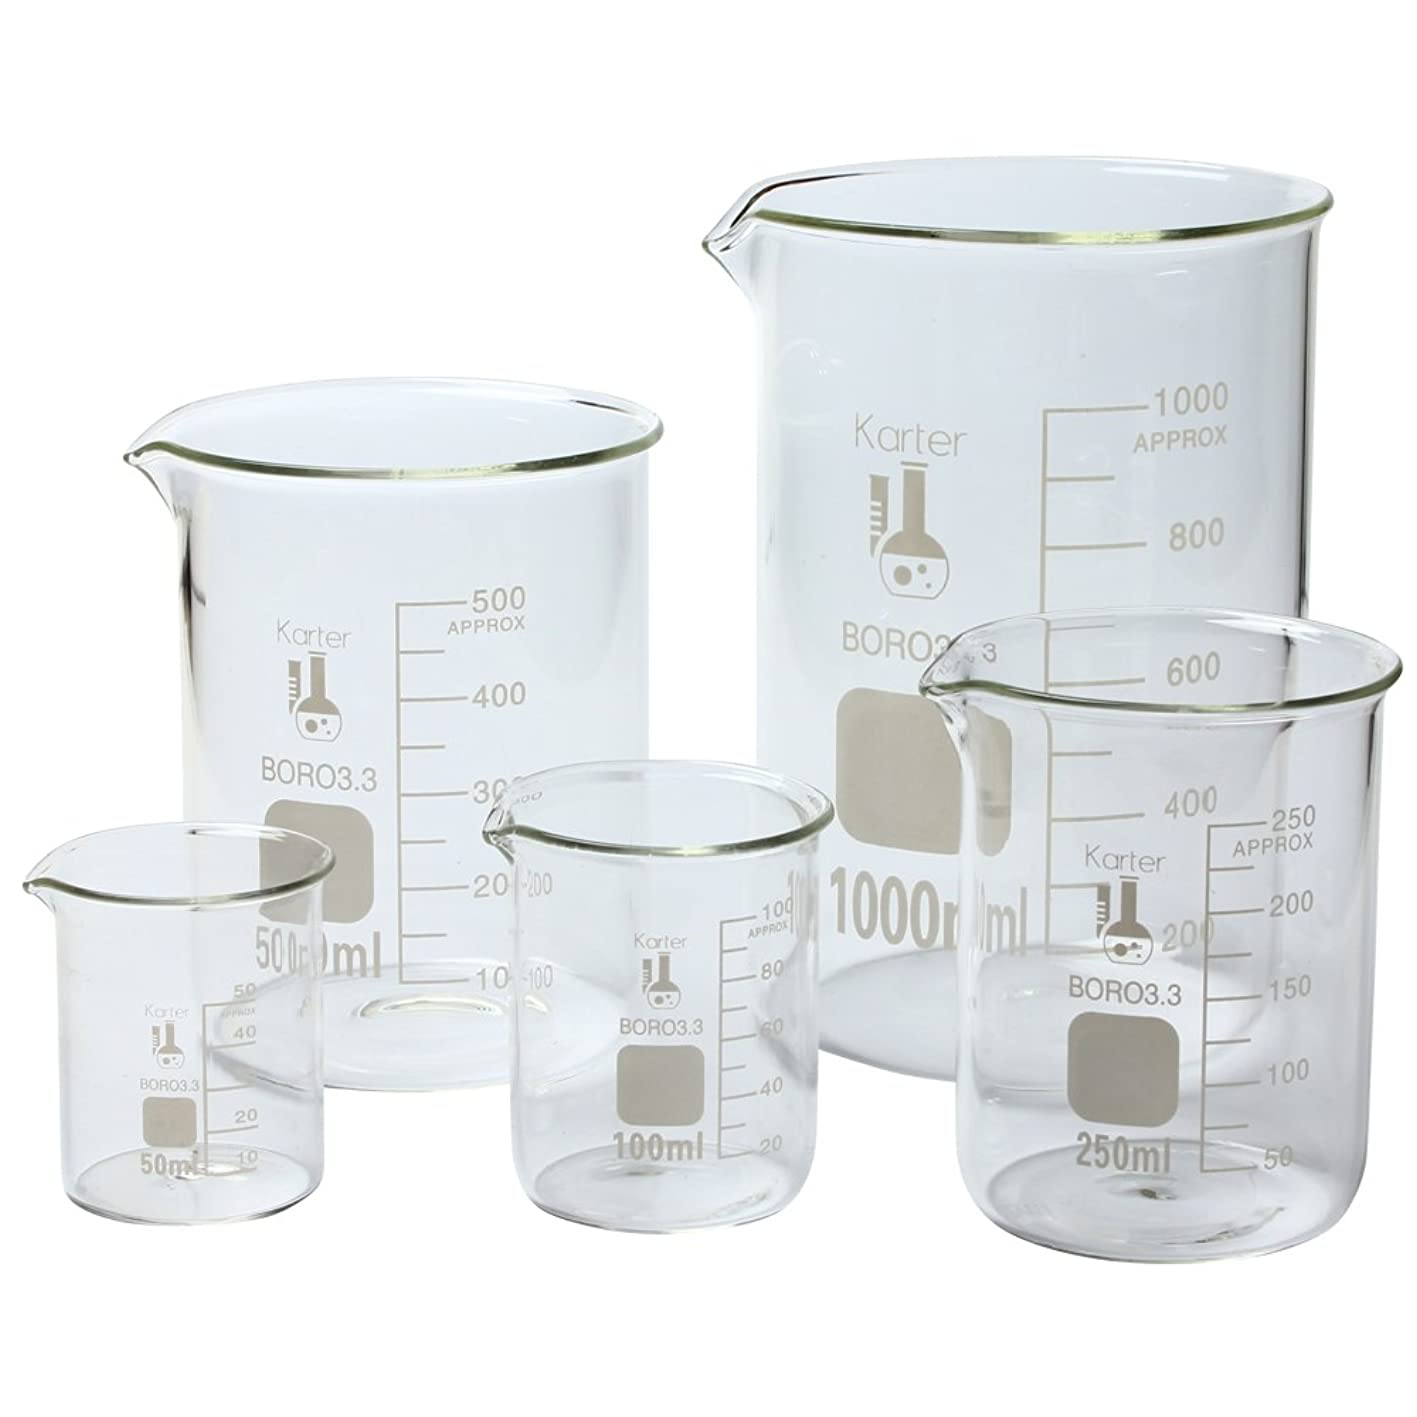 Karter Scientific 213A2 Borosilicate Glass Low Form Glass Beaker, 50/100/250/500/1000 mL (Pack of 5) iaplxjttkzb372